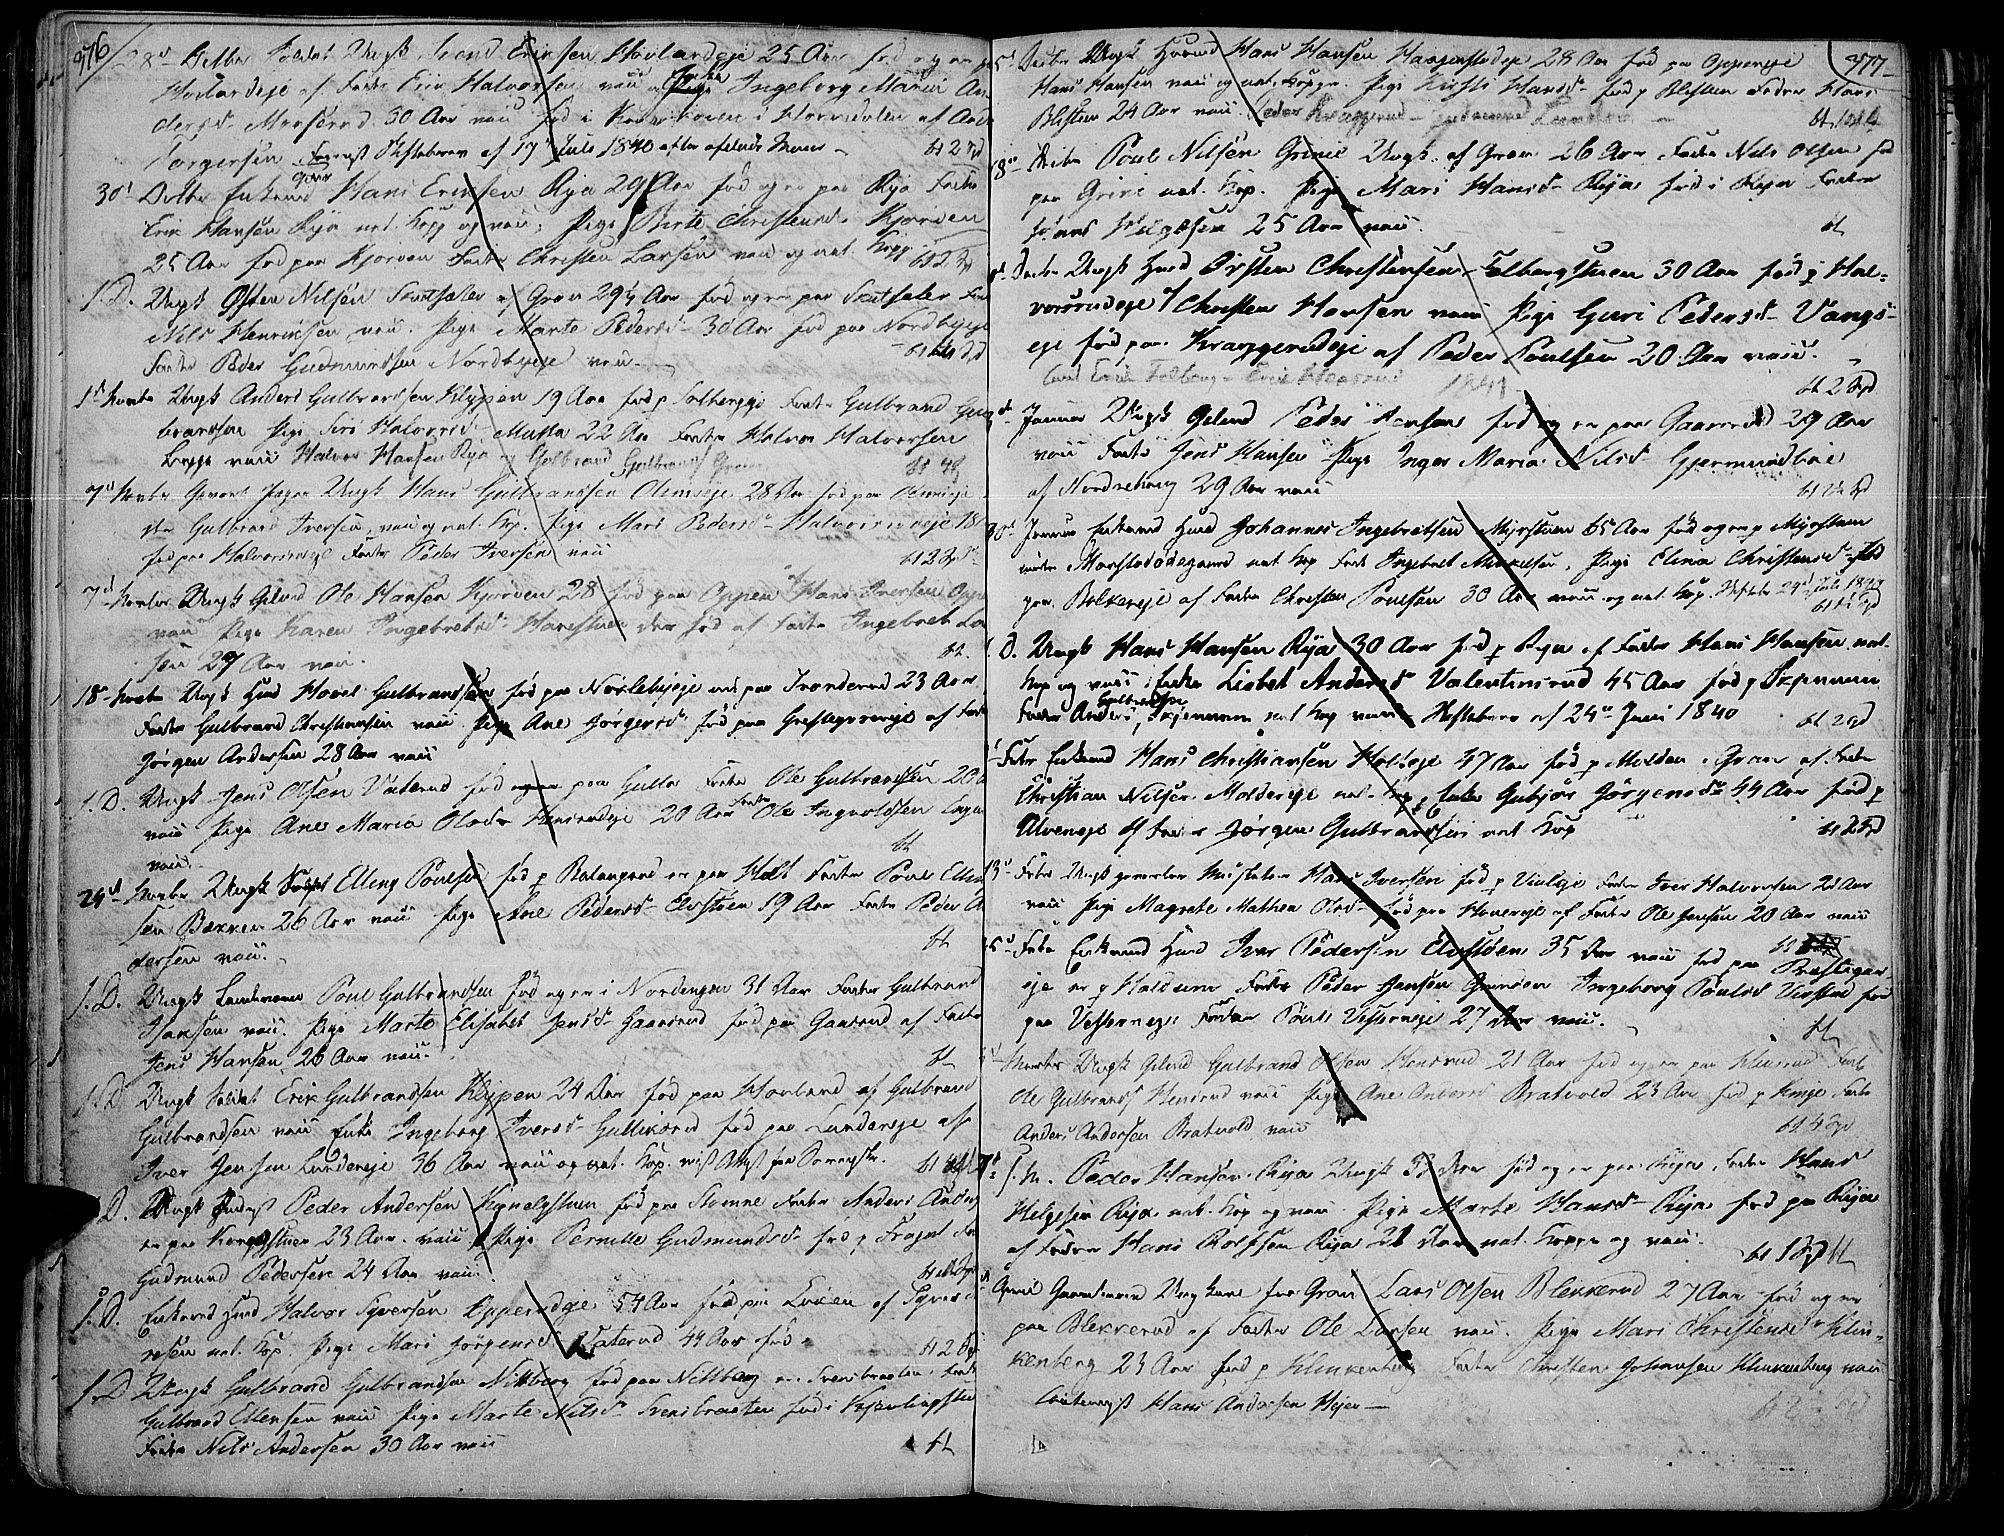 SAH, Jevnaker prestekontor, Ministerialbok nr. 4, 1800-1861, s. 376-377